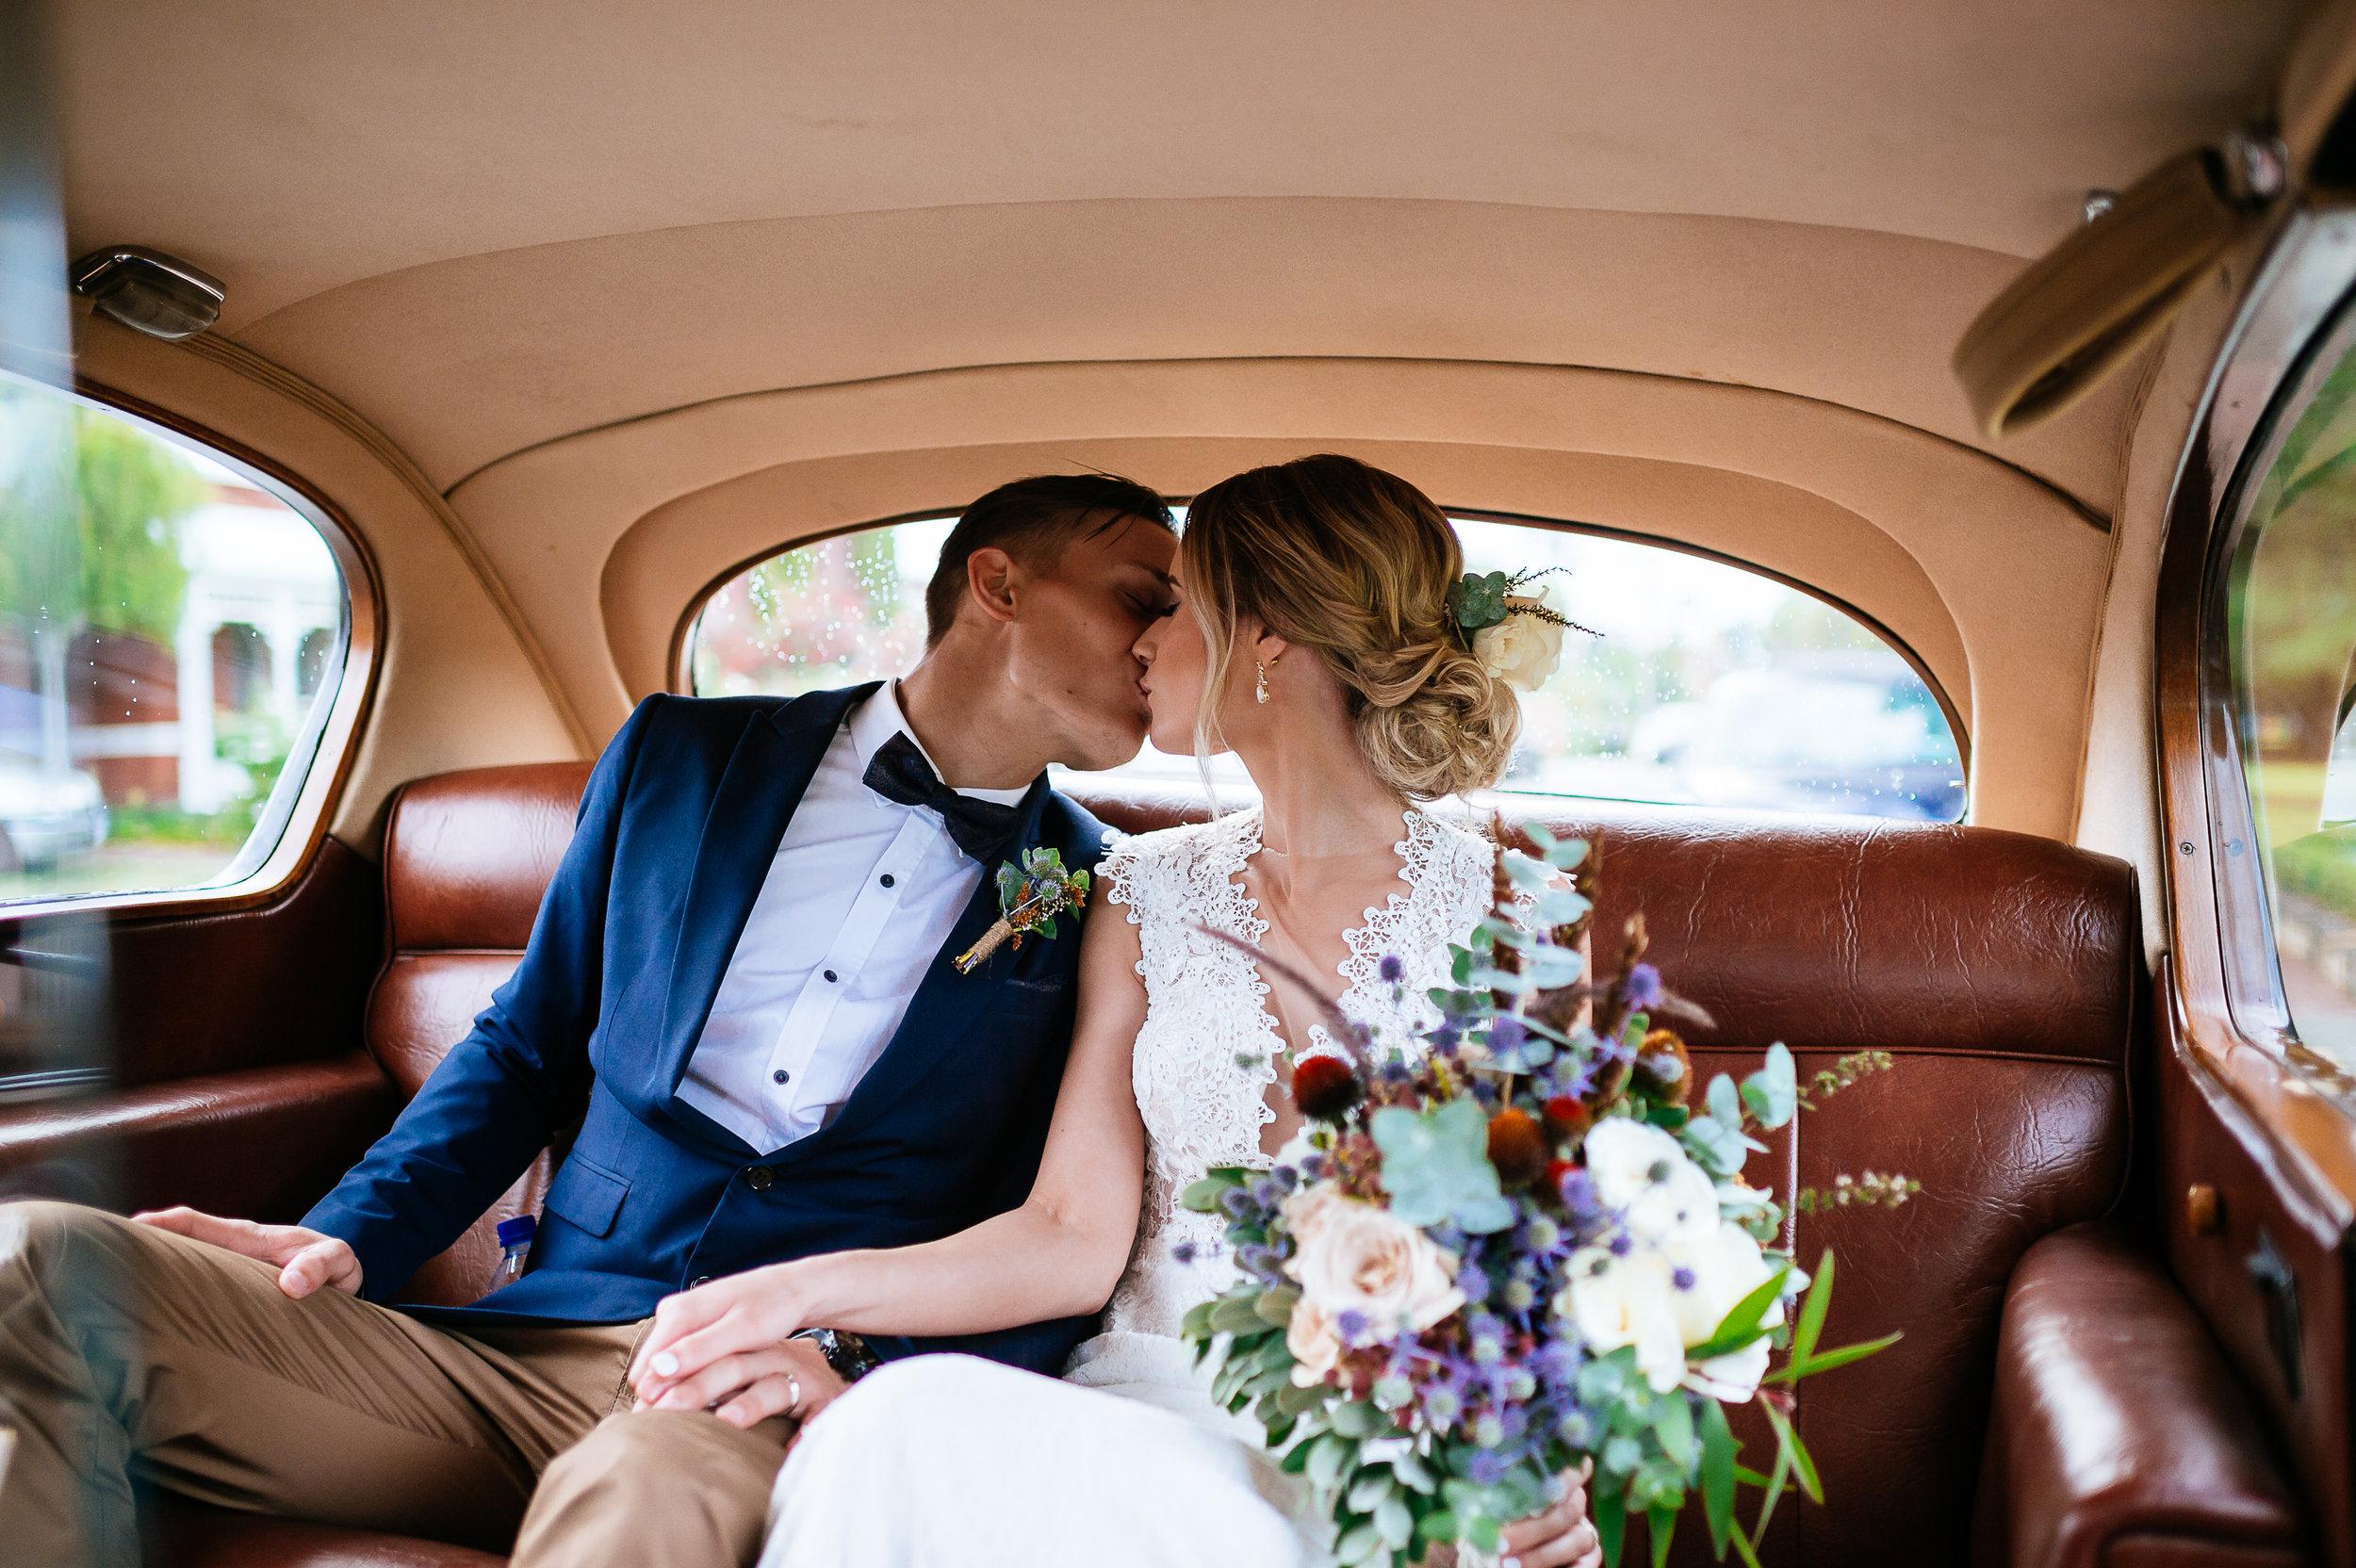 19-Ellen_and_Marcusthe_kiss_perth_wedding_cars_very_nice_classics.jpg